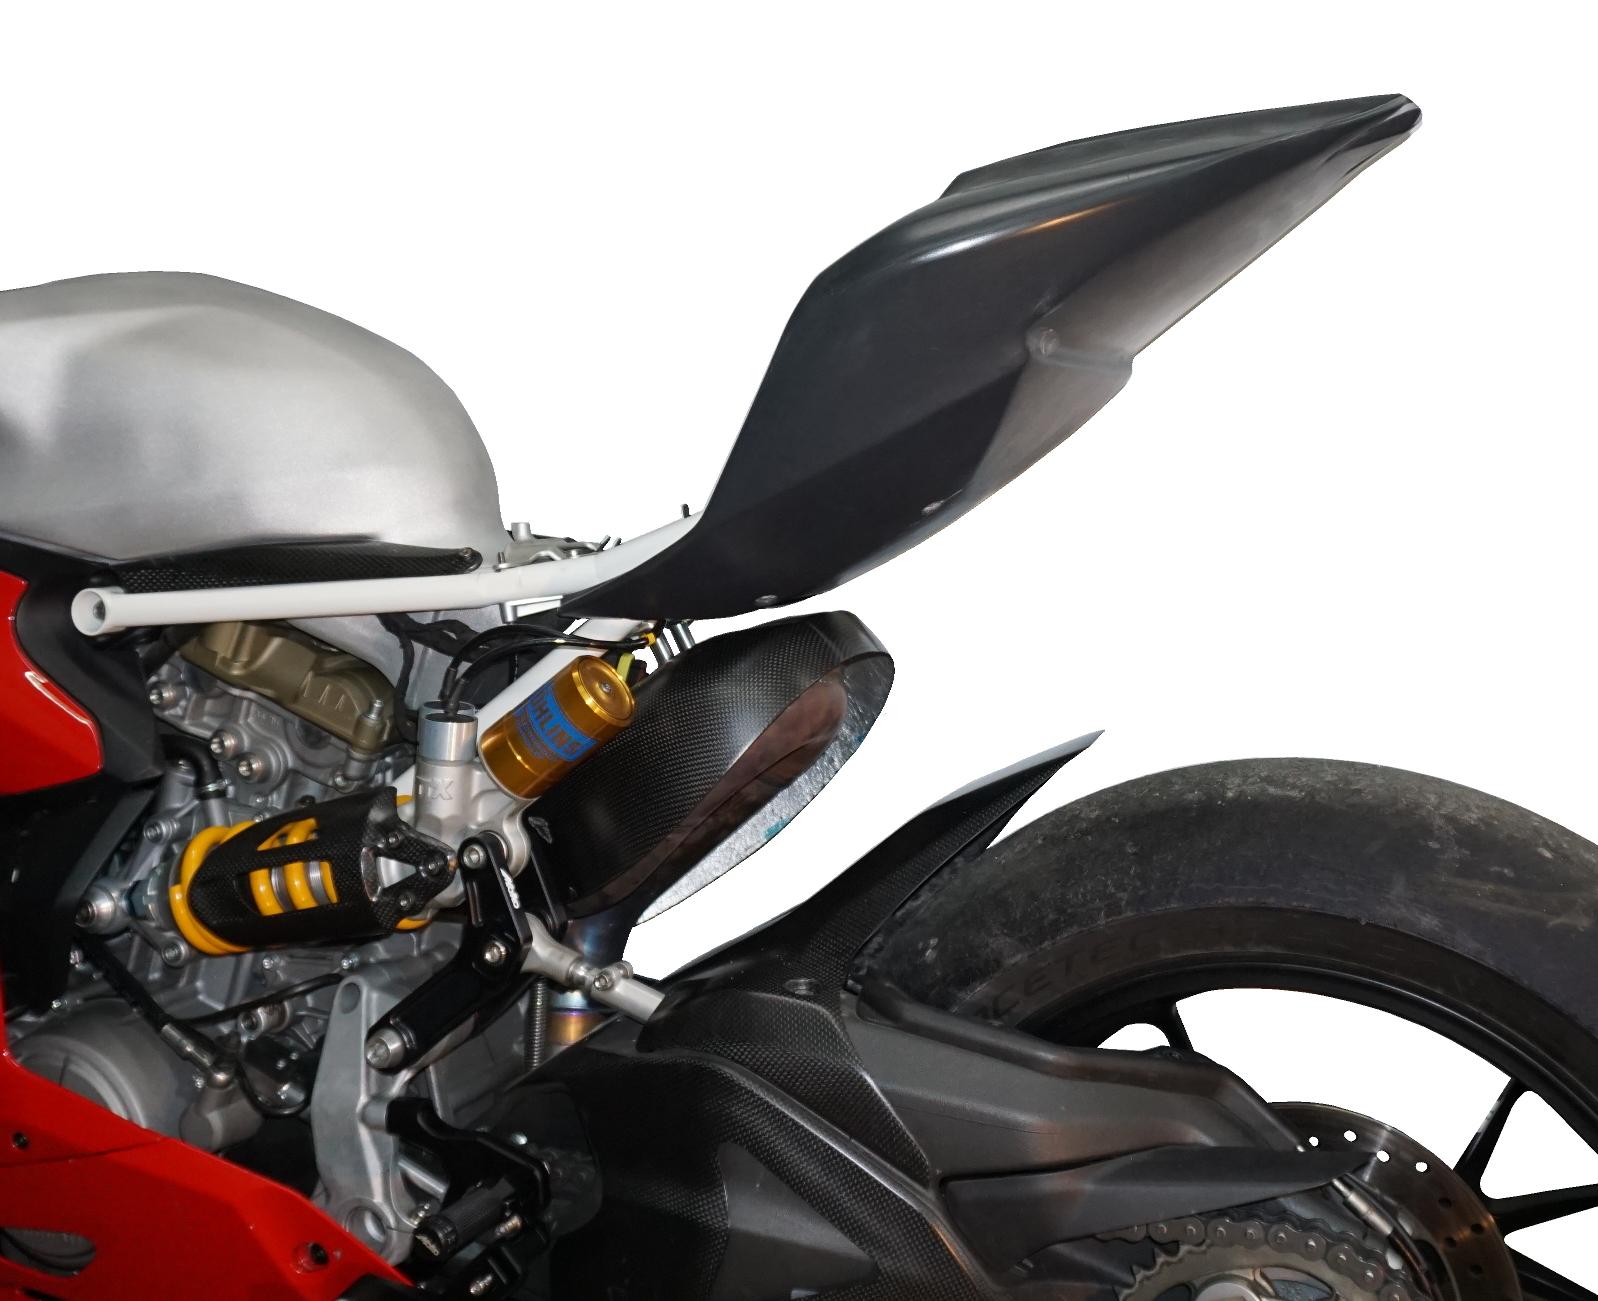 Heckrahmen 08.002.11 Heckverkleidung 08.002.14 Moko Ducati Panigale Heck Natur